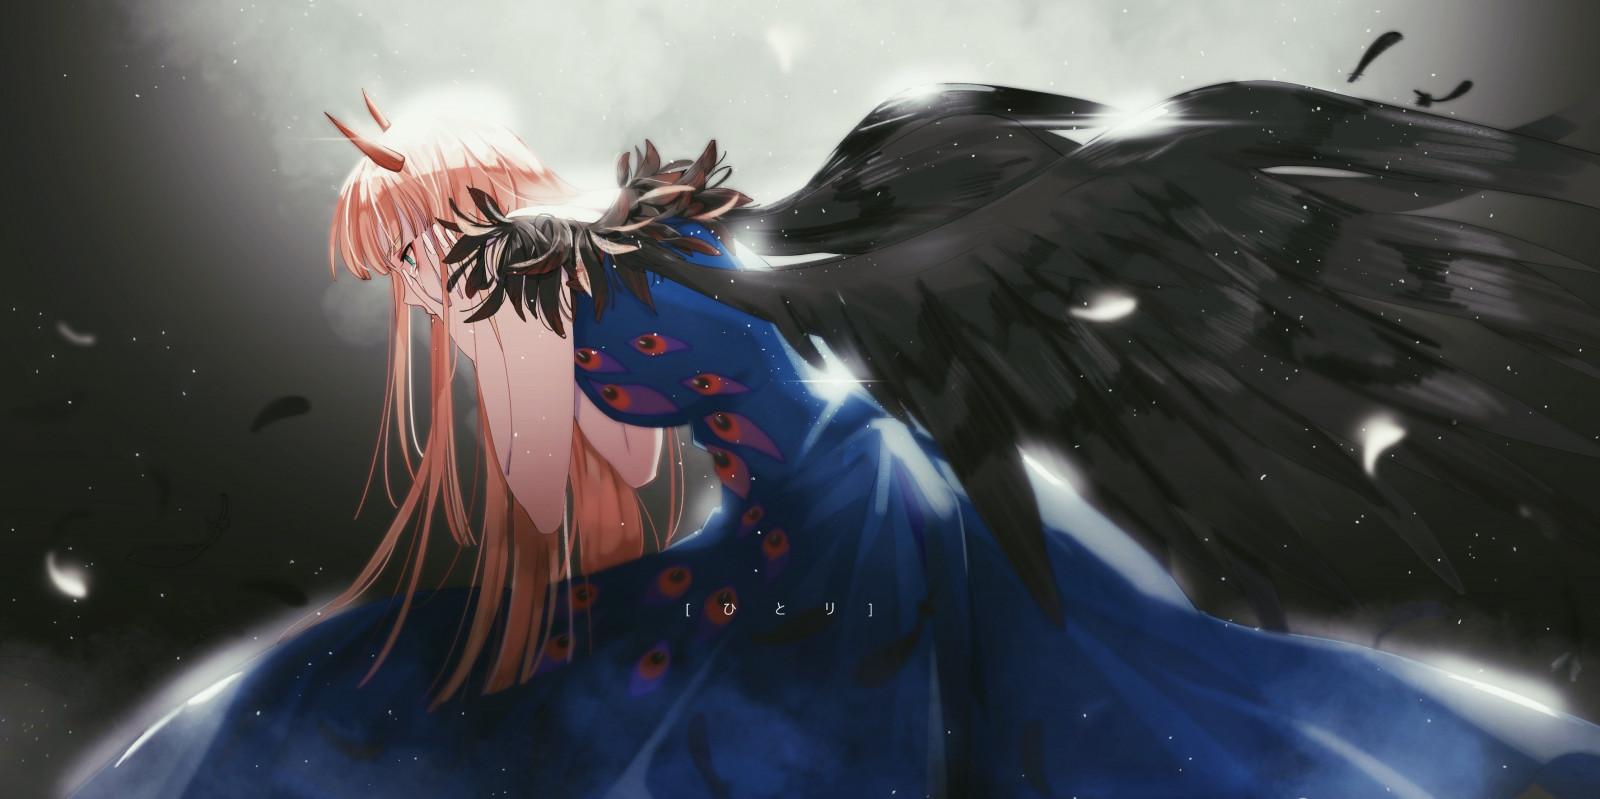 Wallpaper : Anime Girls, Darling In The FranXX, Darling In